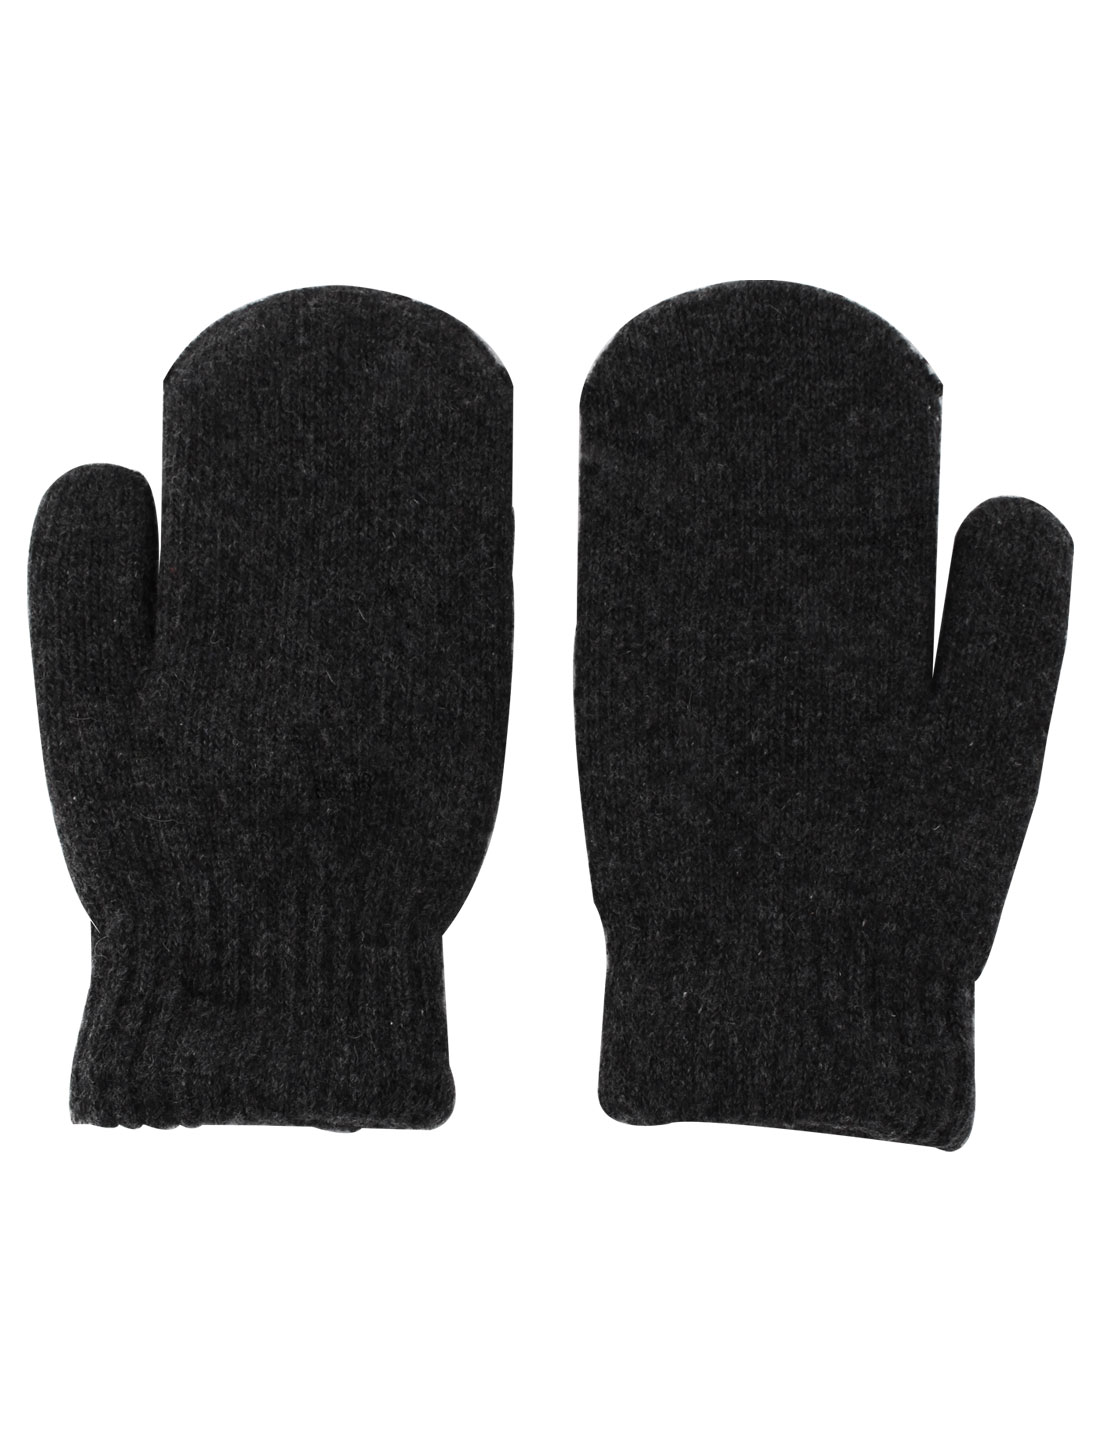 Acrylic Pure Unisex Winter Elastic Wrist Warmer Mitten Gloves Pair Black